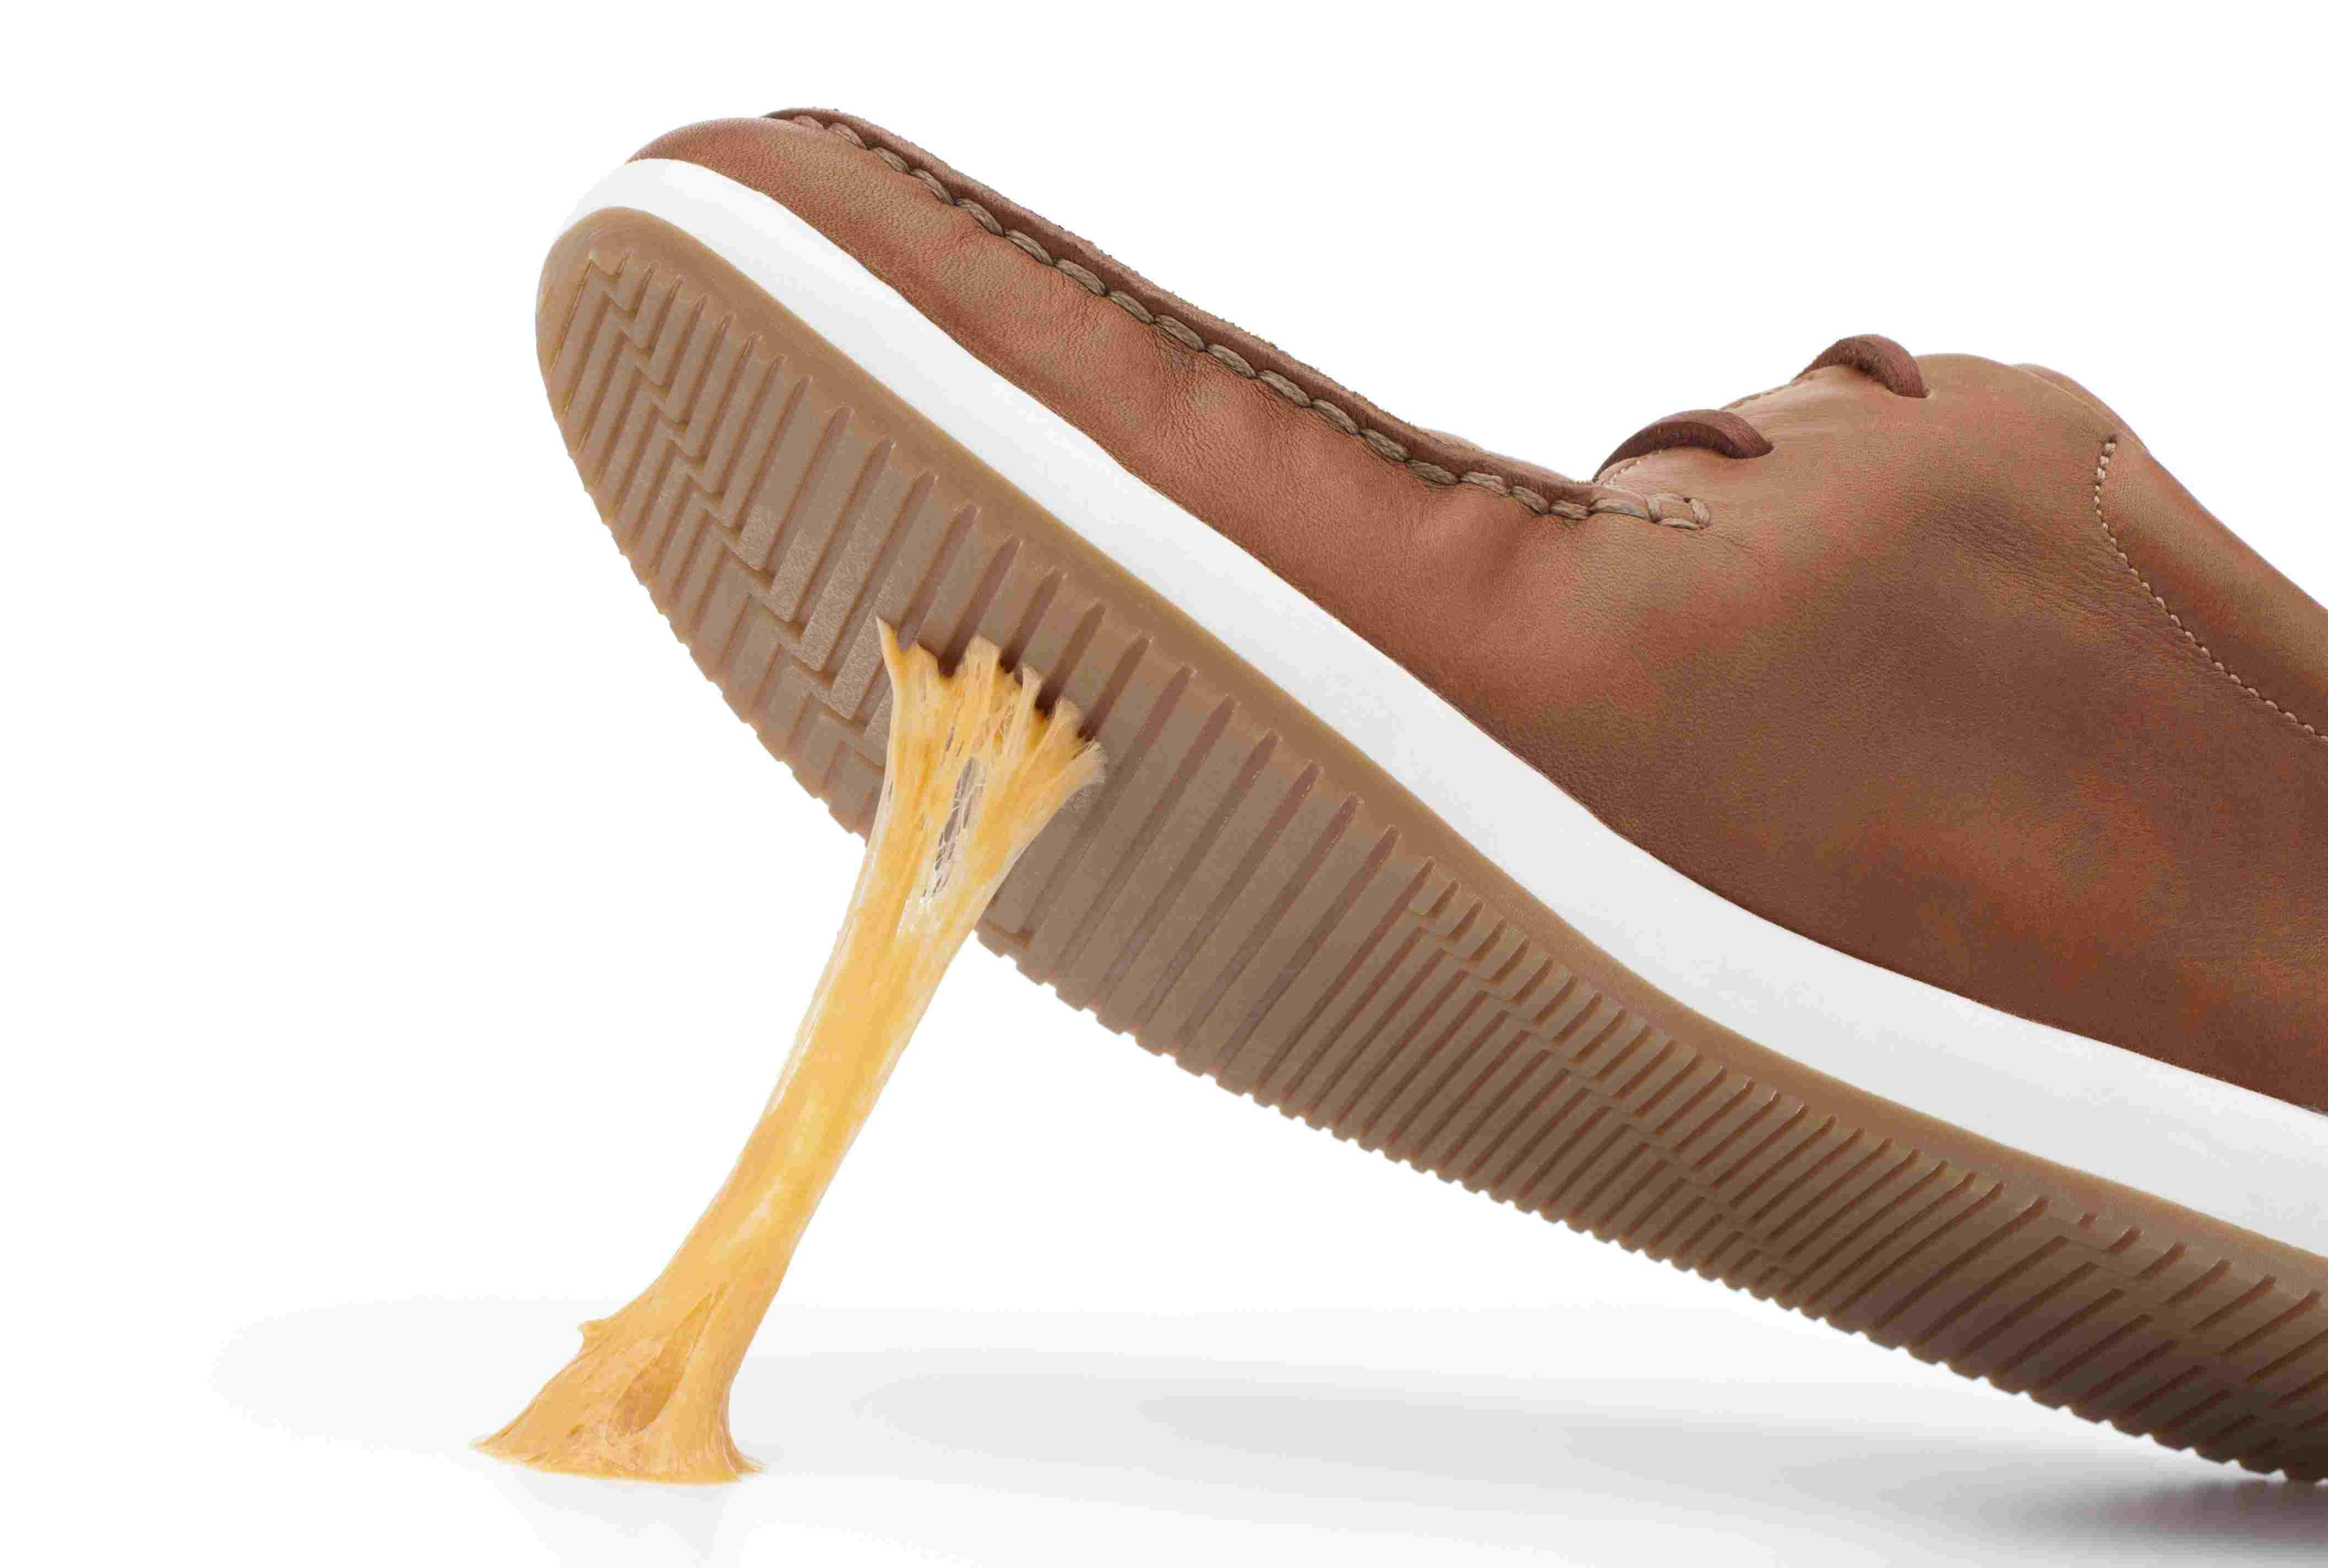 Gum on a shoe